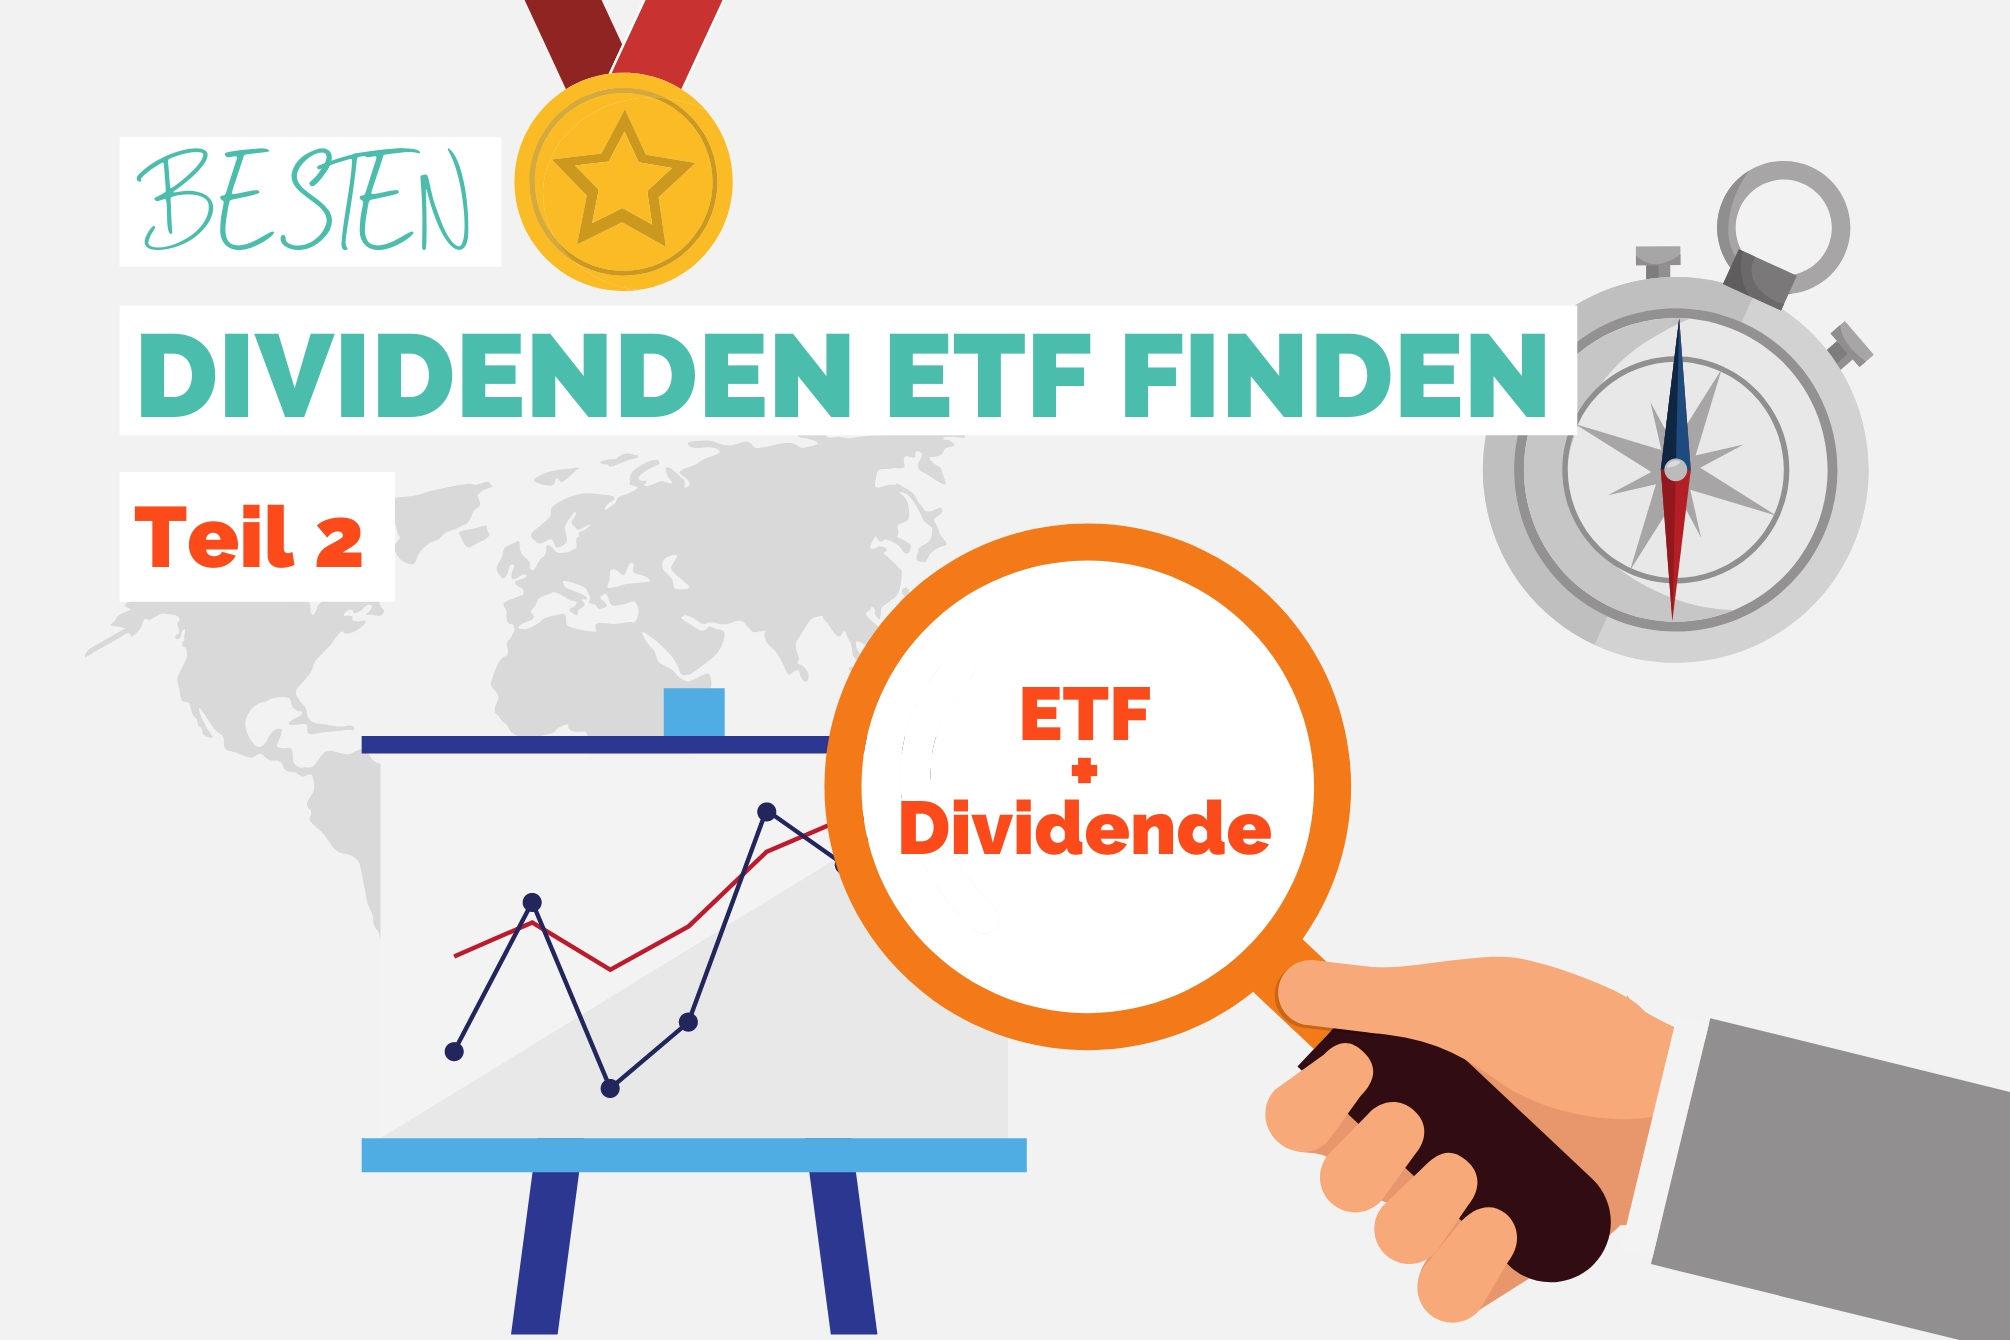 Dividenden ETF